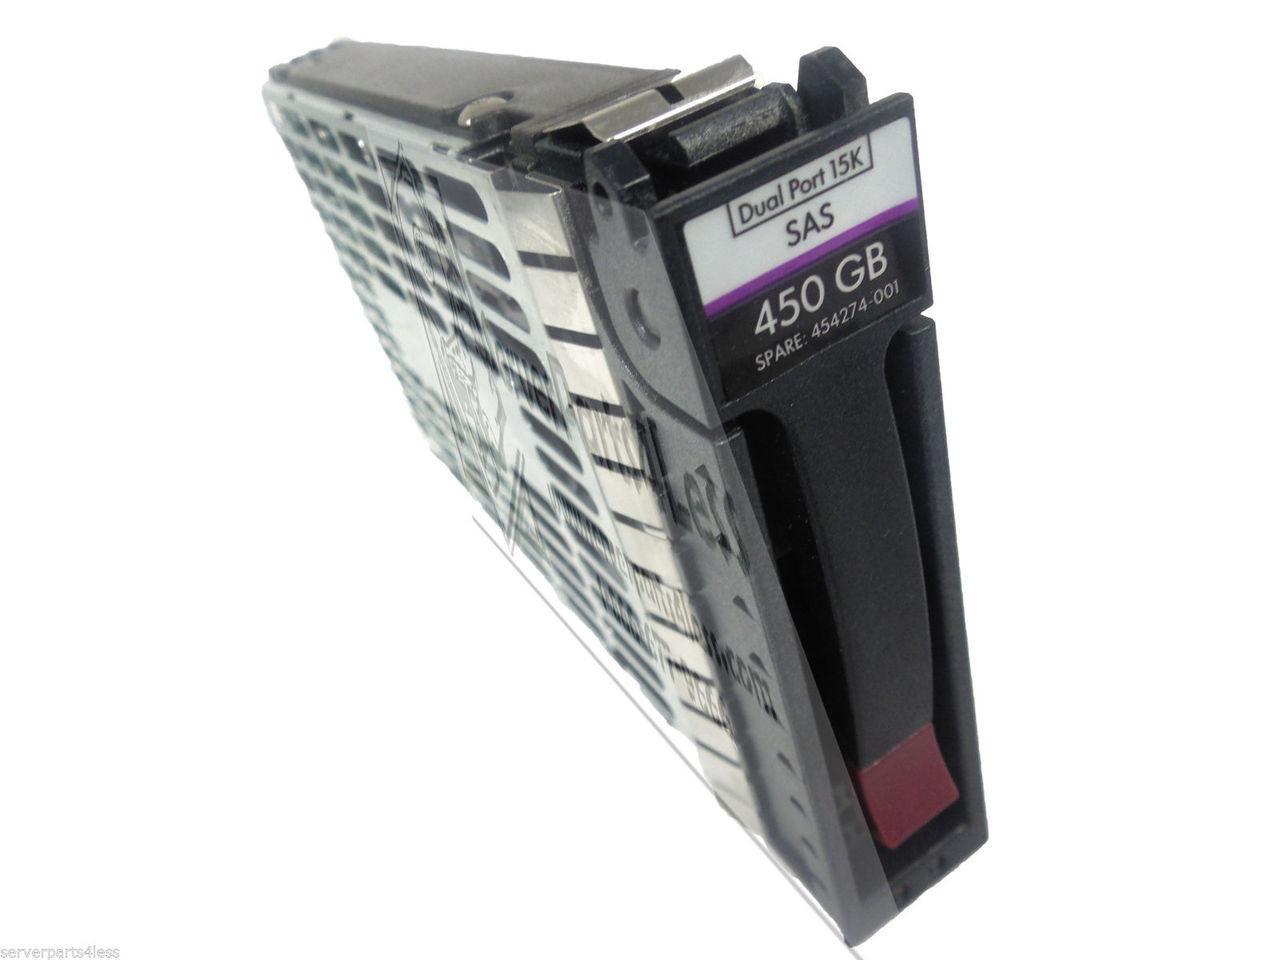 ActionStar DB15-2 VGA 2way data switch